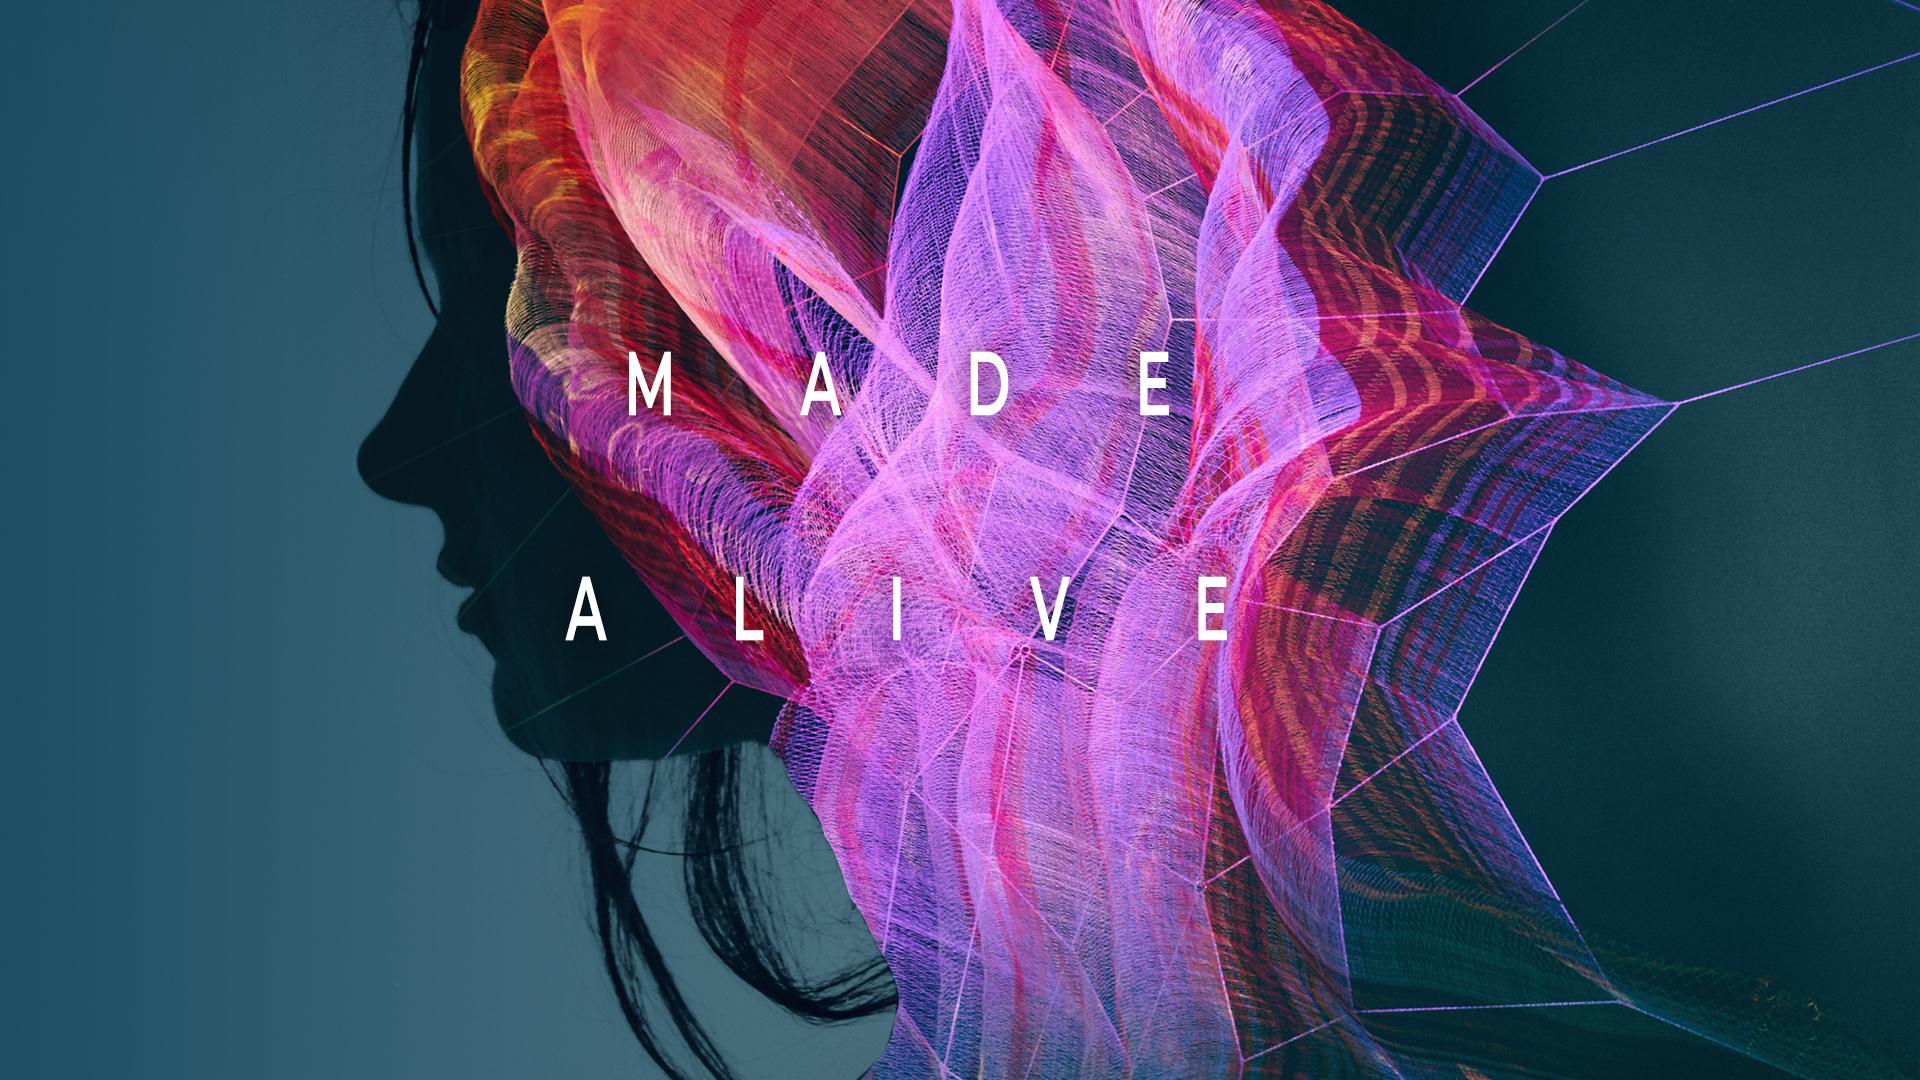 Made Alive.jpg